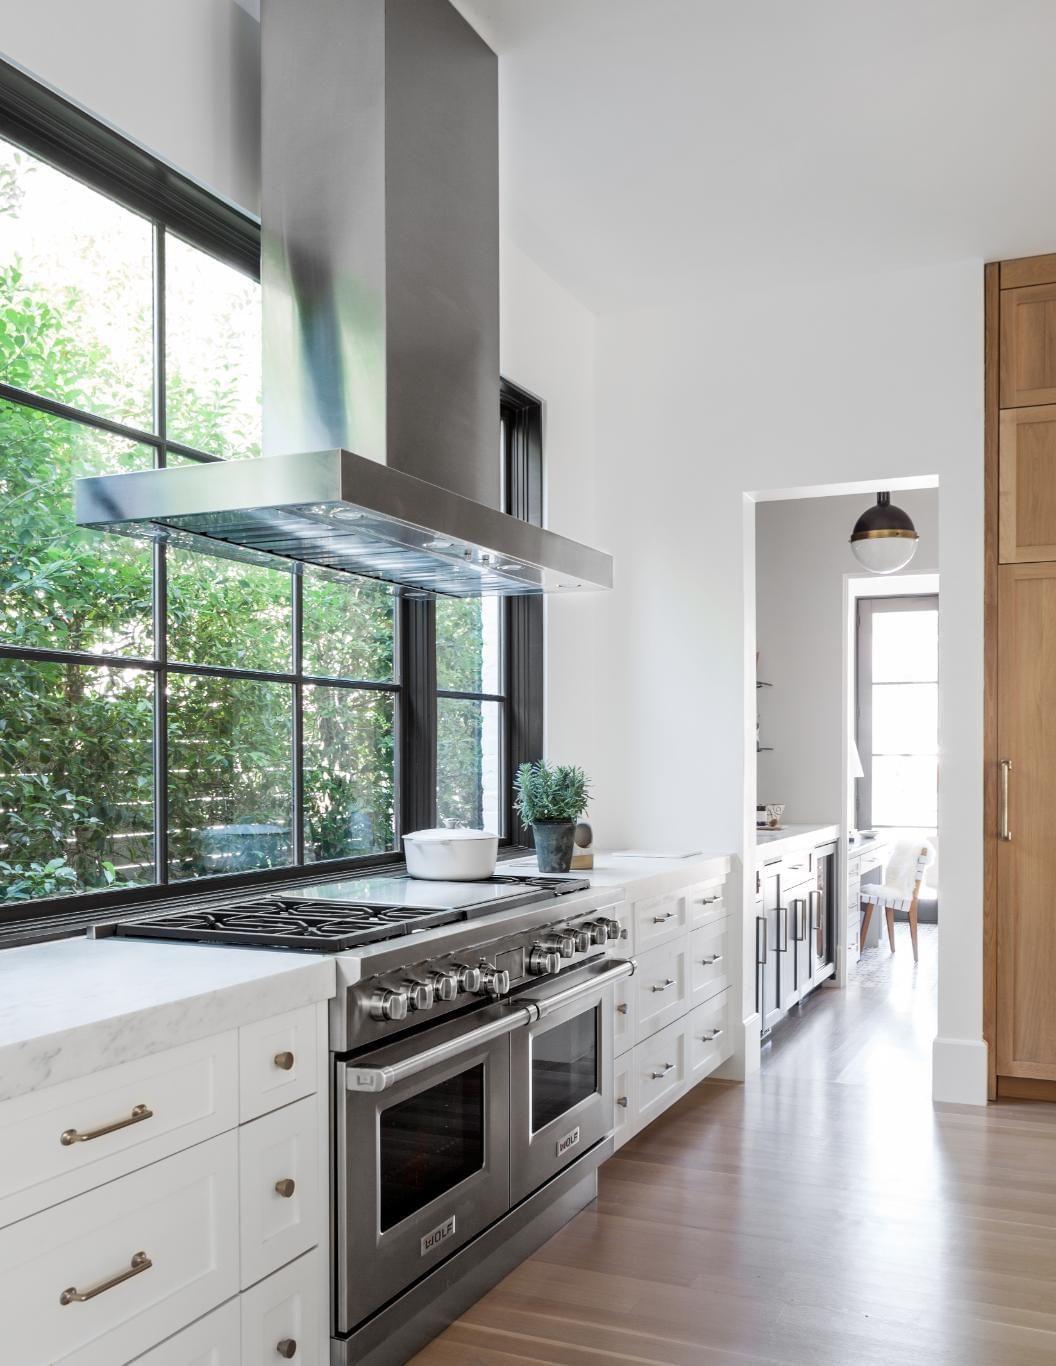 40+ Modern kitchen cabinets near me ideas in 2021